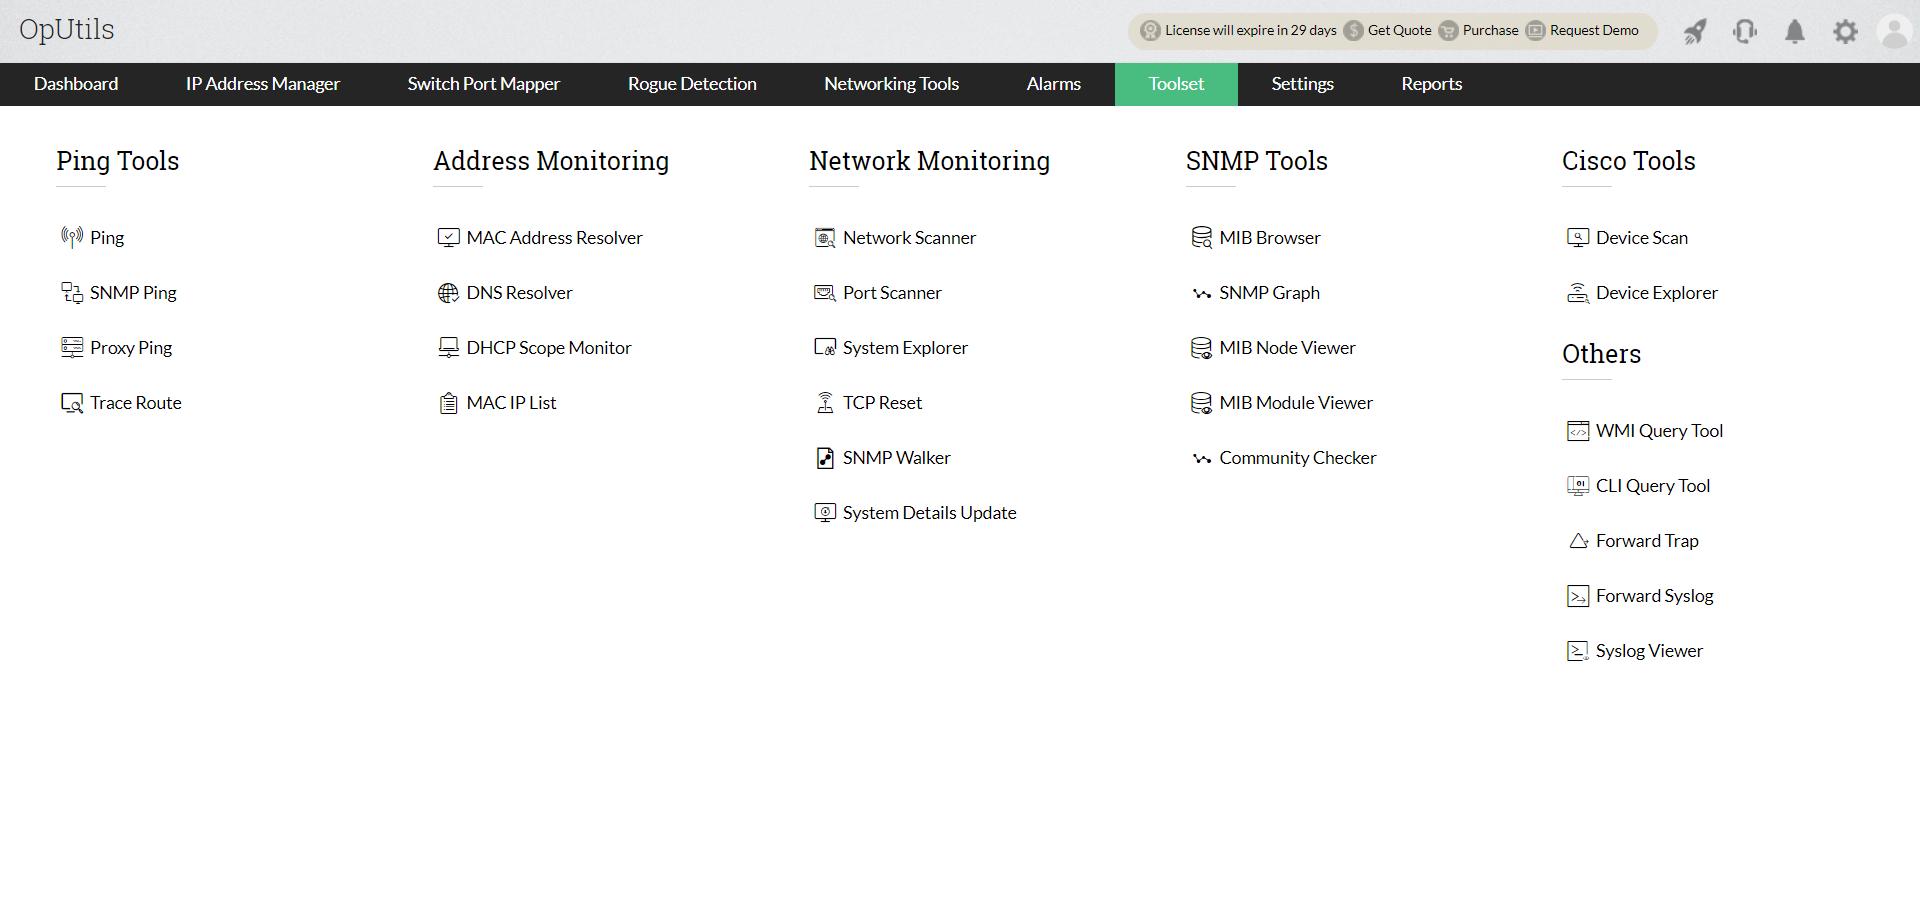 IP Address Manager Tools - ManageEngine Oputils